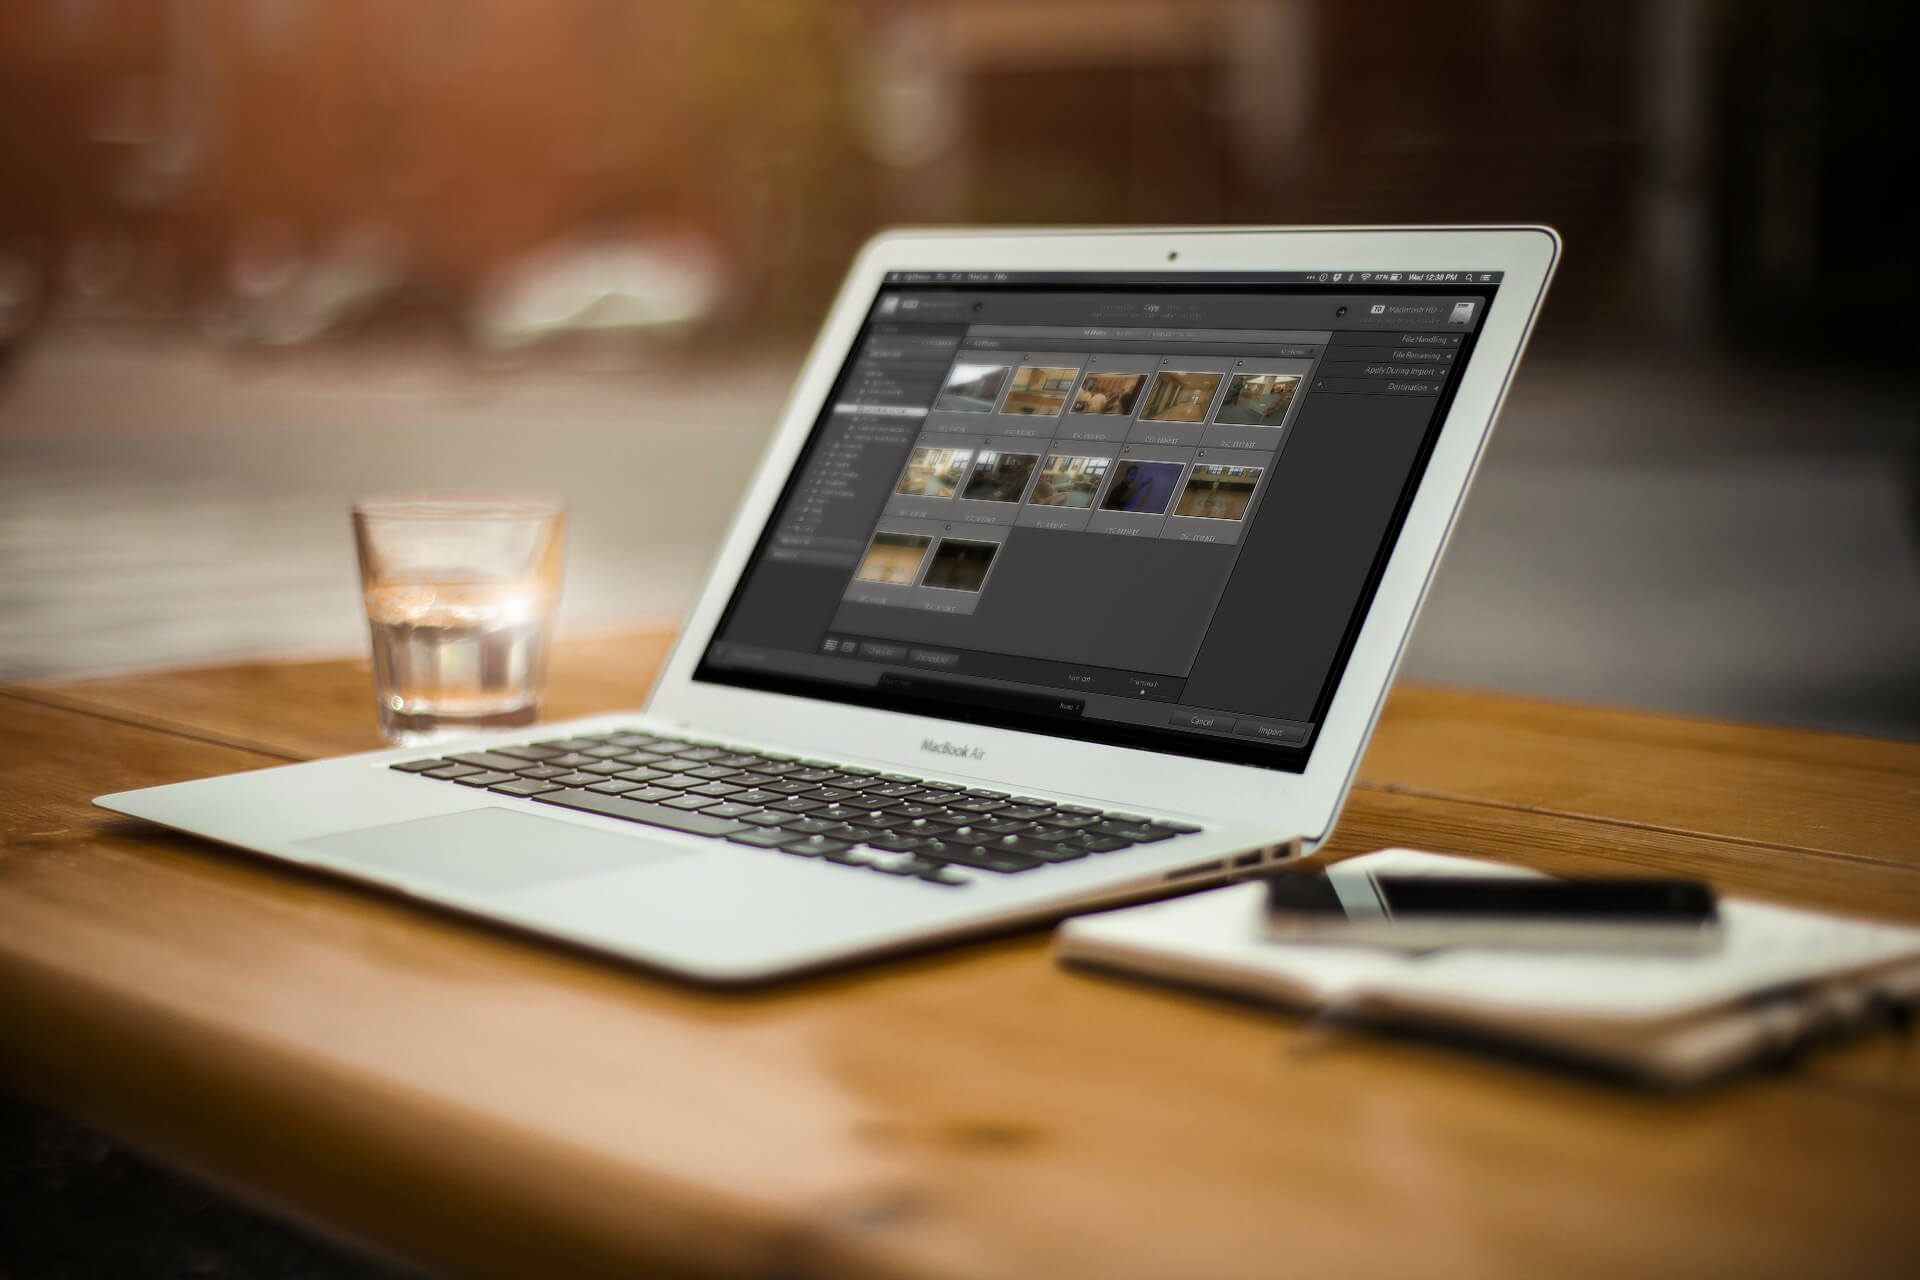 Learn Lightroom Basics Online: Lightroom Beginners Course by Sleeklens